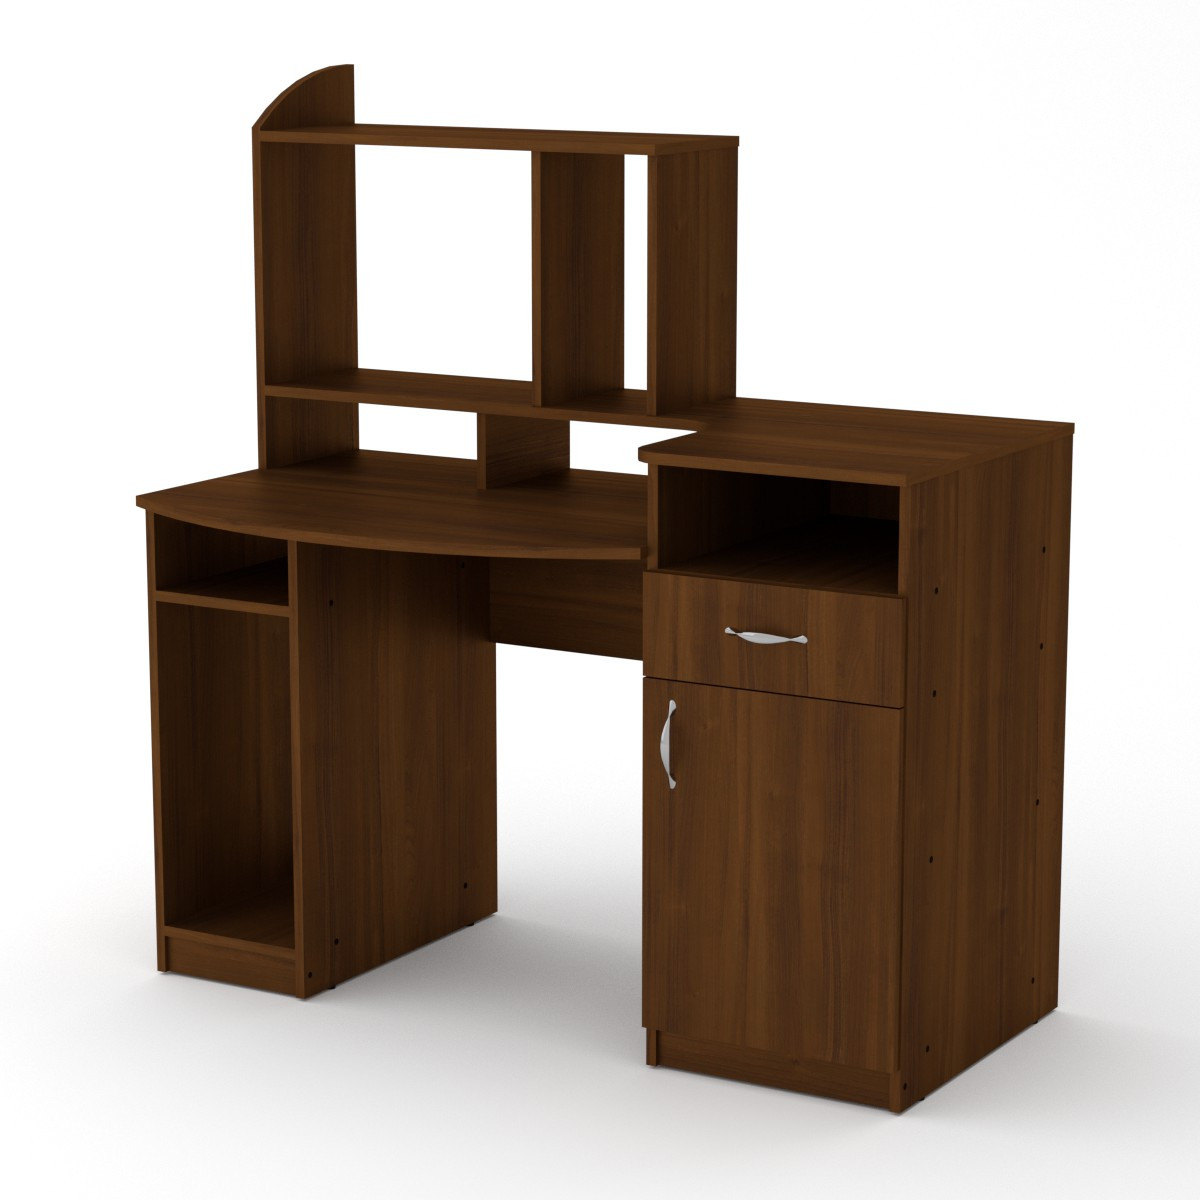 Стол компьютерный Комфорт-2 орех экко Компанит (129х70х139 см)